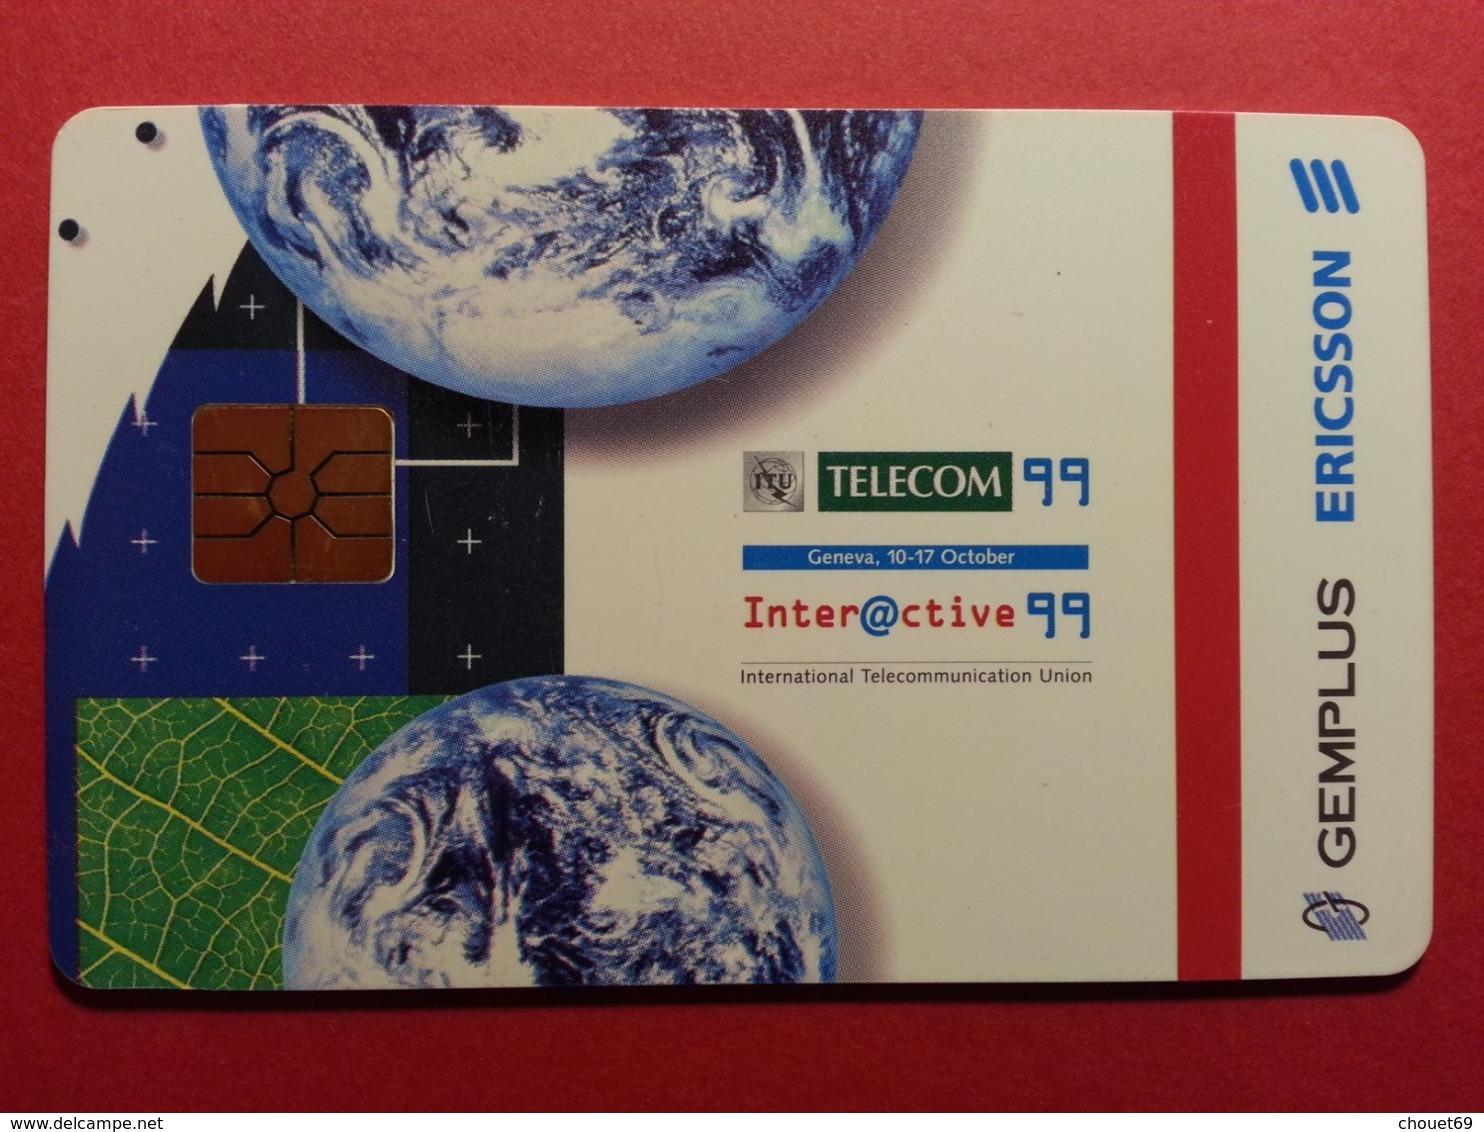 DEMO TEST GEMPLUS ERICSSON TELECOM 99 Geneva INTERACTIVE (BF1217 - Telefonkarten